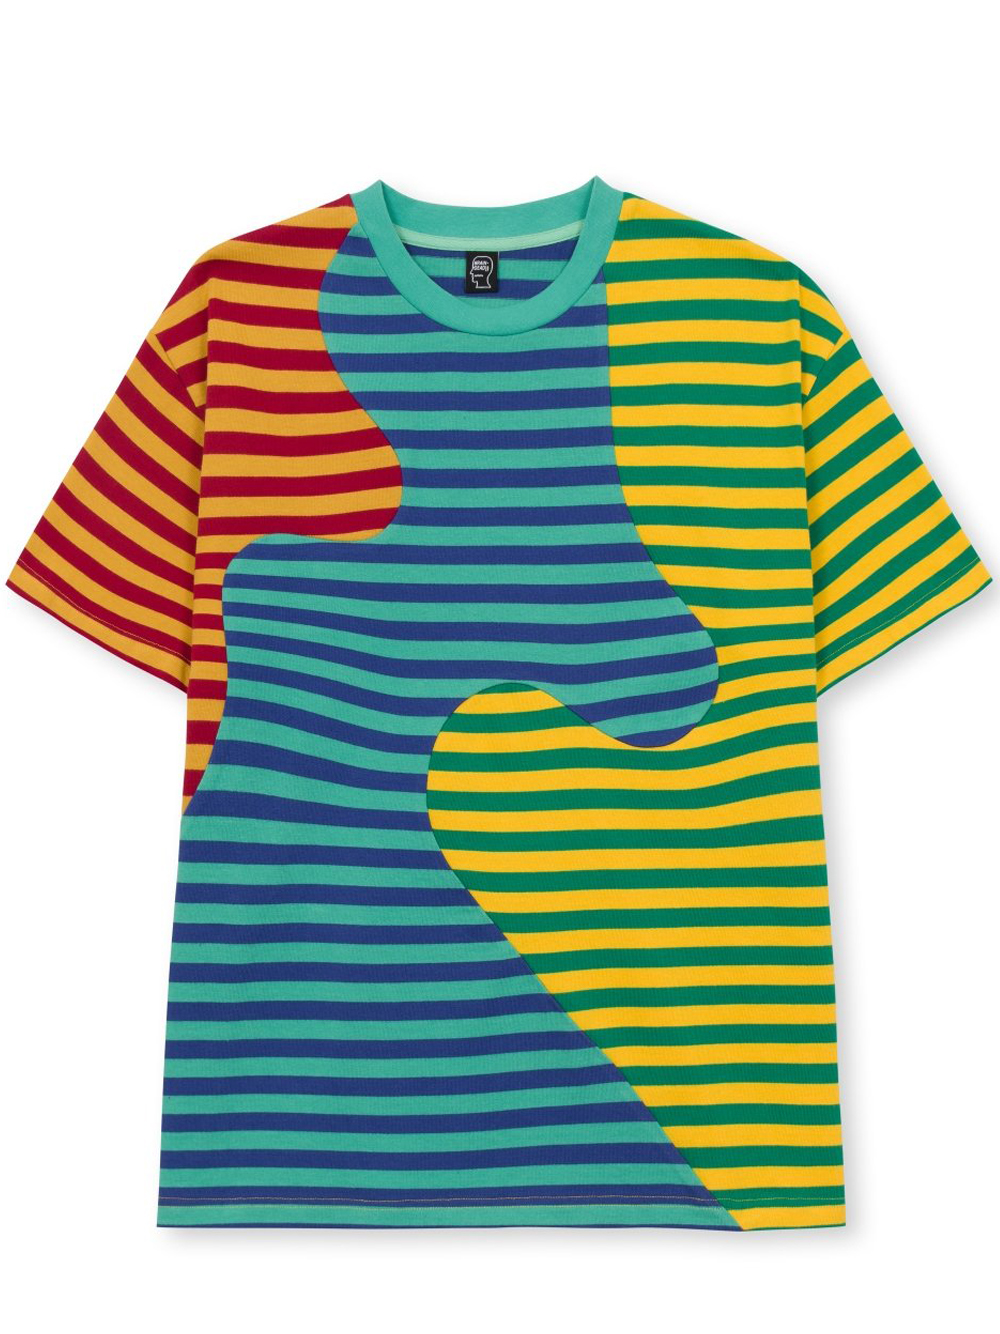 stripe t-shirt man multicolor in cotton BRAIN DEAD | T-shirts | F21T00001828GREEN